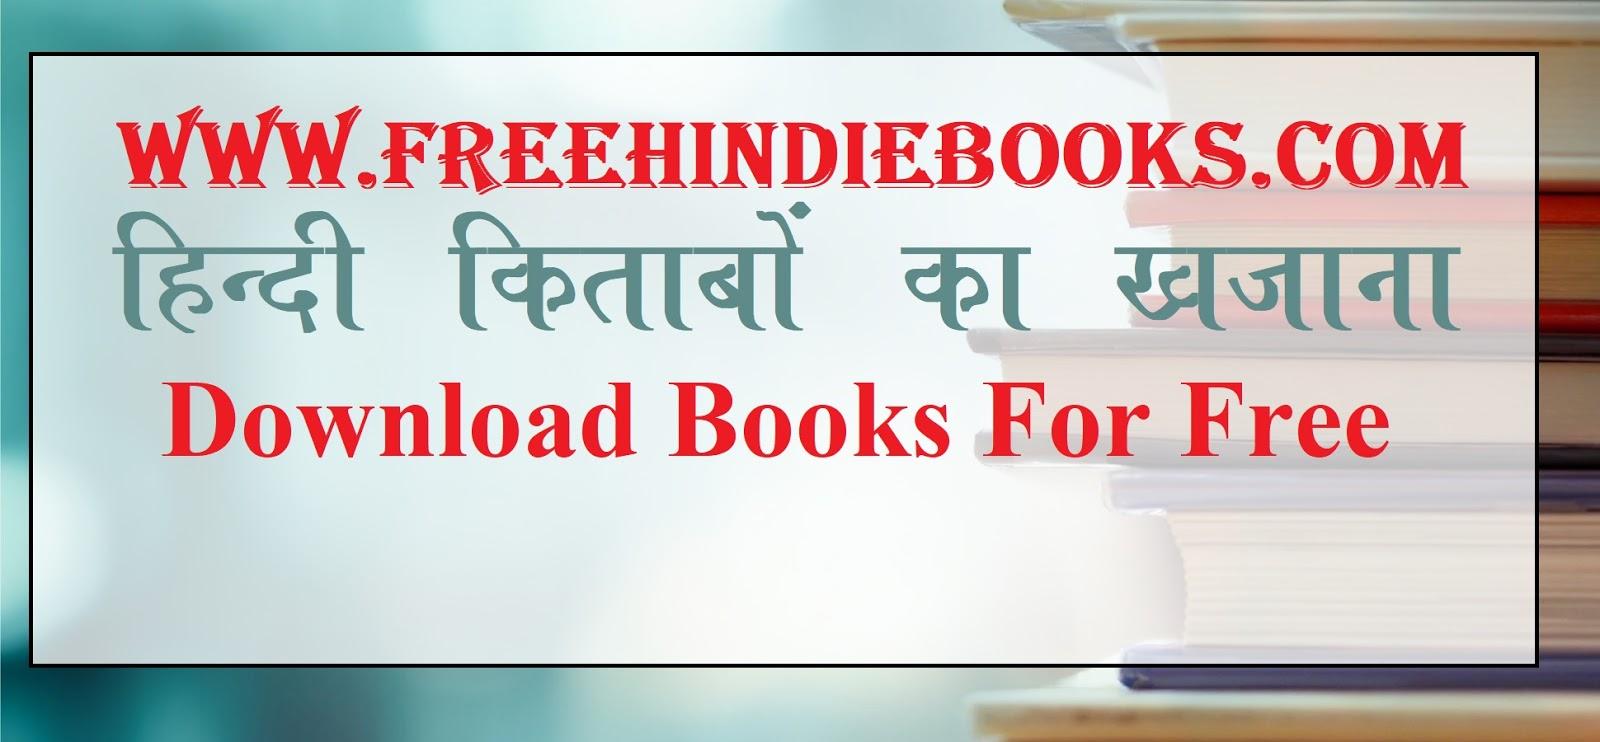 Kala jadu  taweez~ amliyat: asli kala jadoo   free books online.